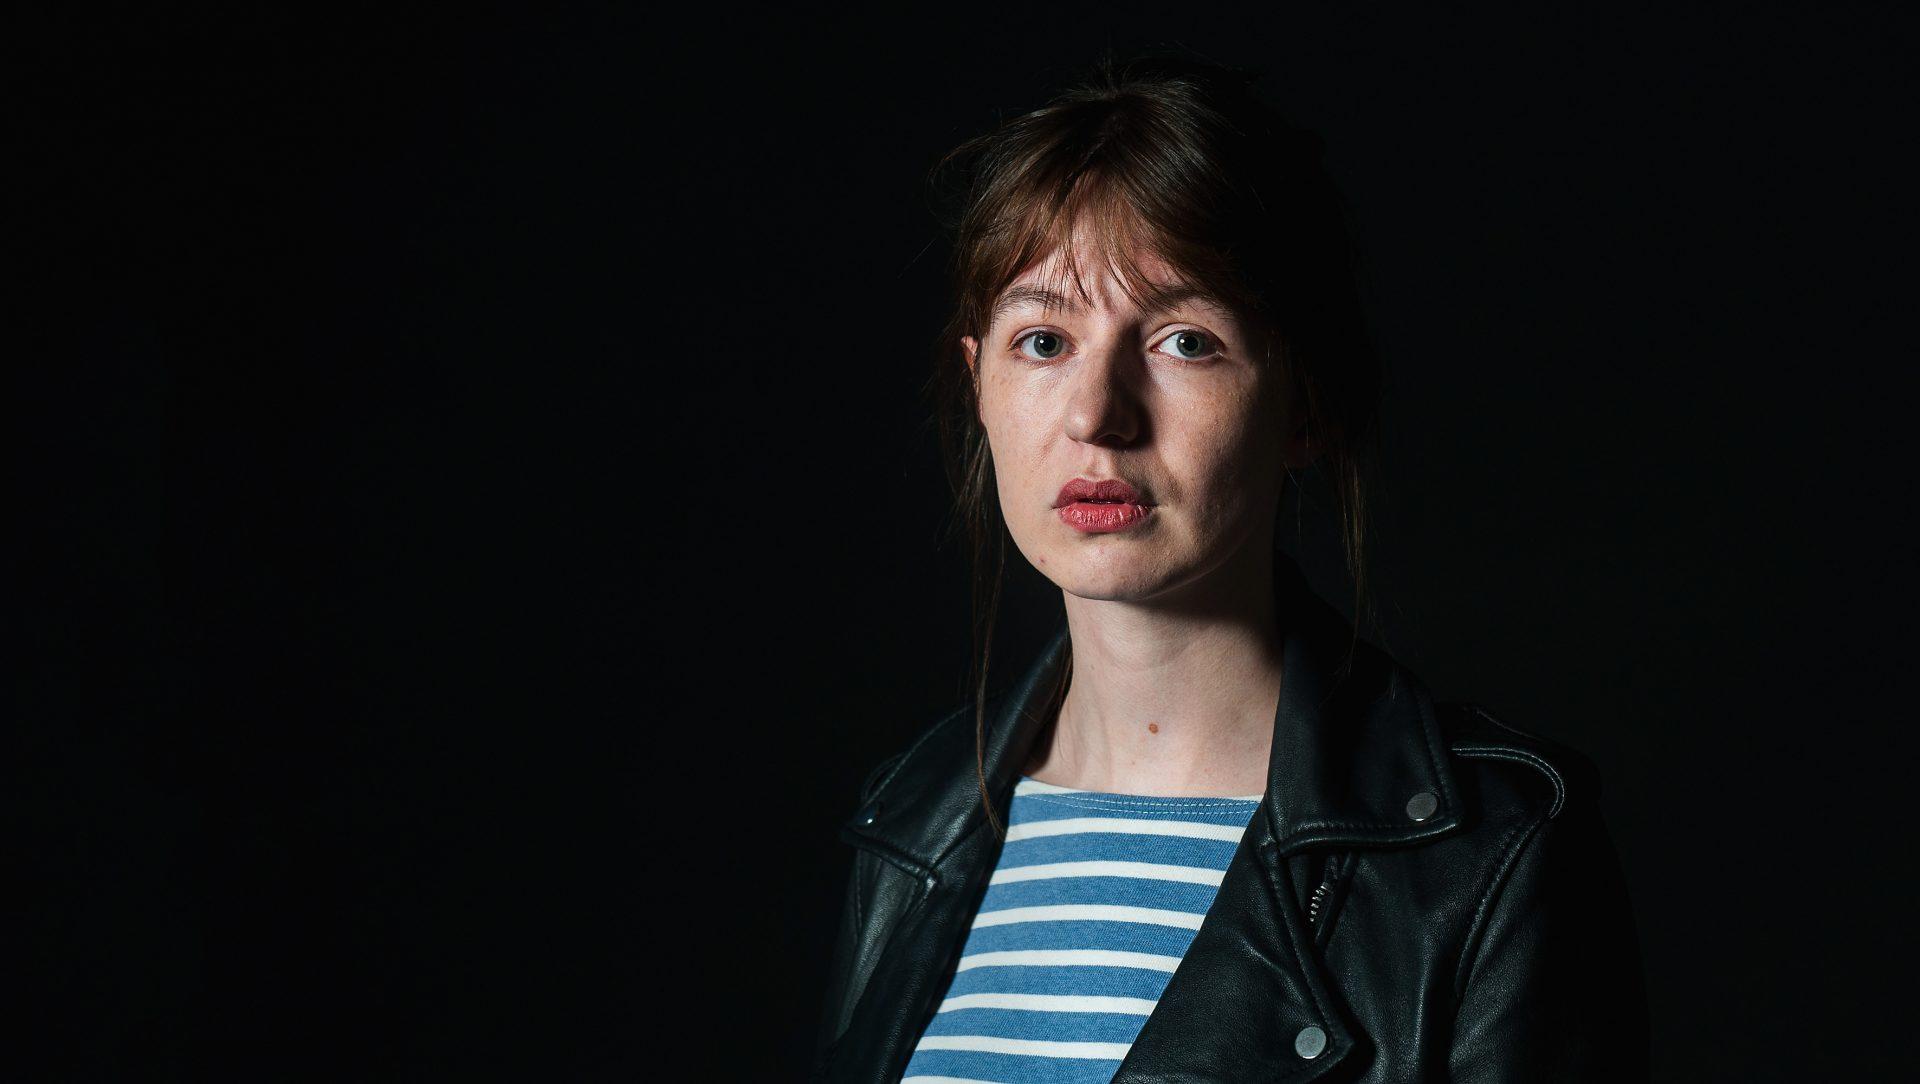 Sally Rooney, at a photocall for the 2017 Edinburgh International Book Festival. Credit: 2017 Simone Padovani/ Awakening/Getty